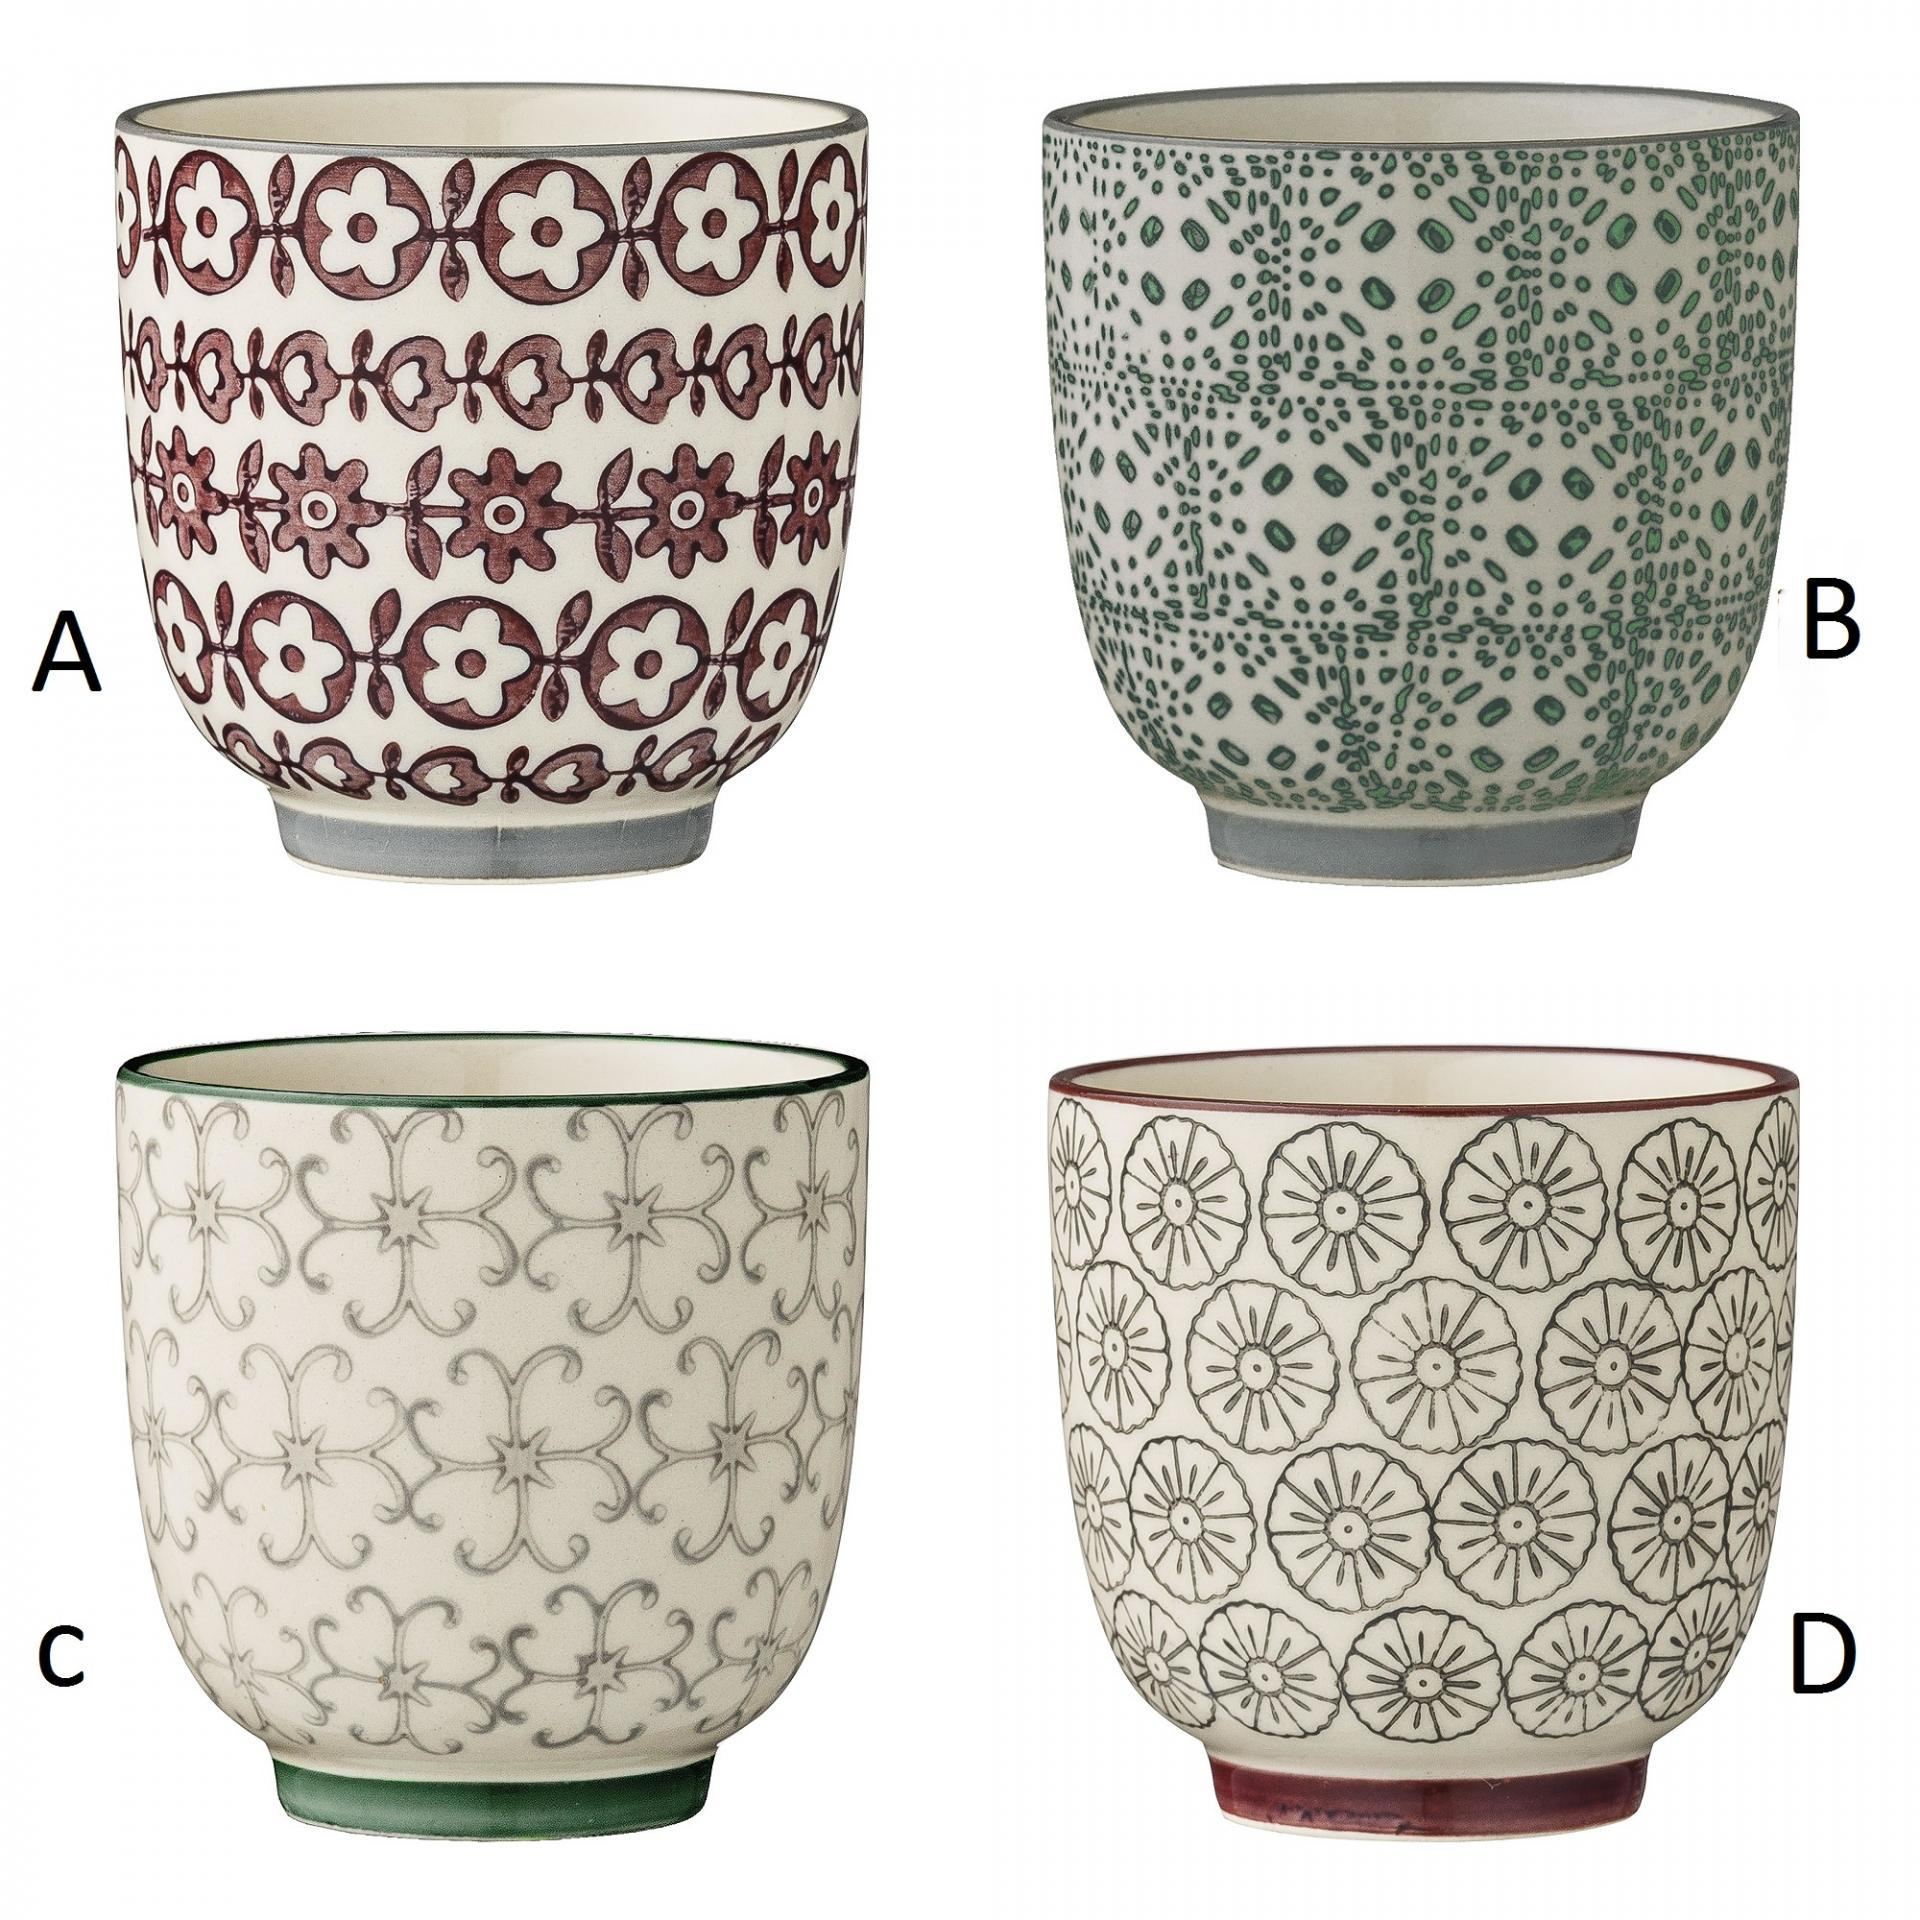 Bloomingville Keramický kalíšek Karine - 4 druhy Fialové květiny, multi barva, keramika